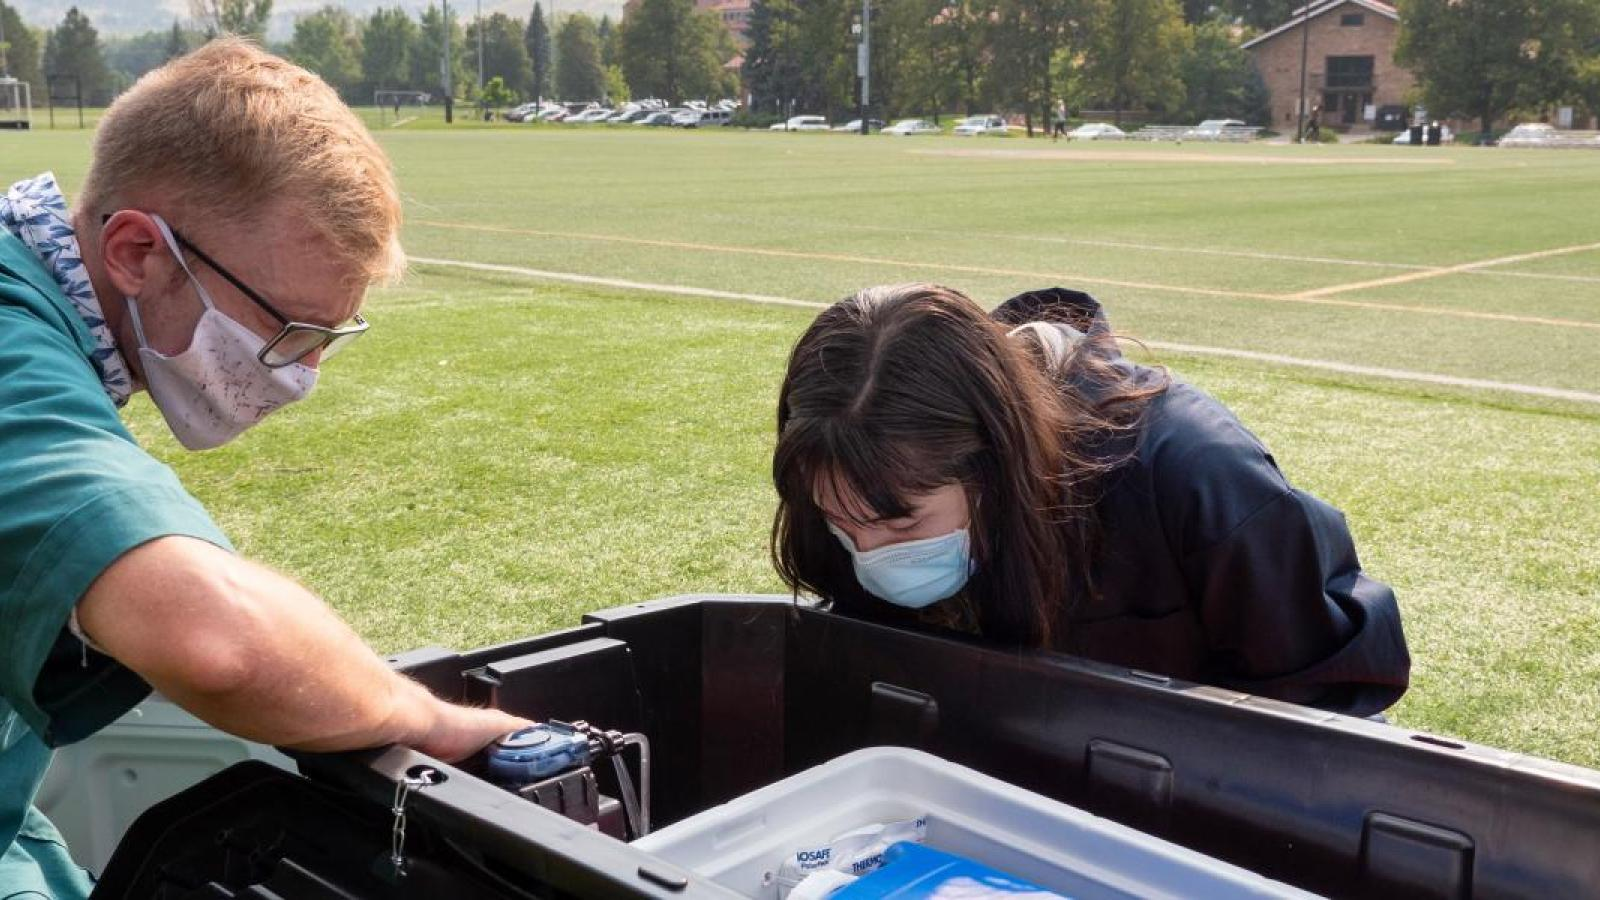 CU Boulder wastewater monitoring